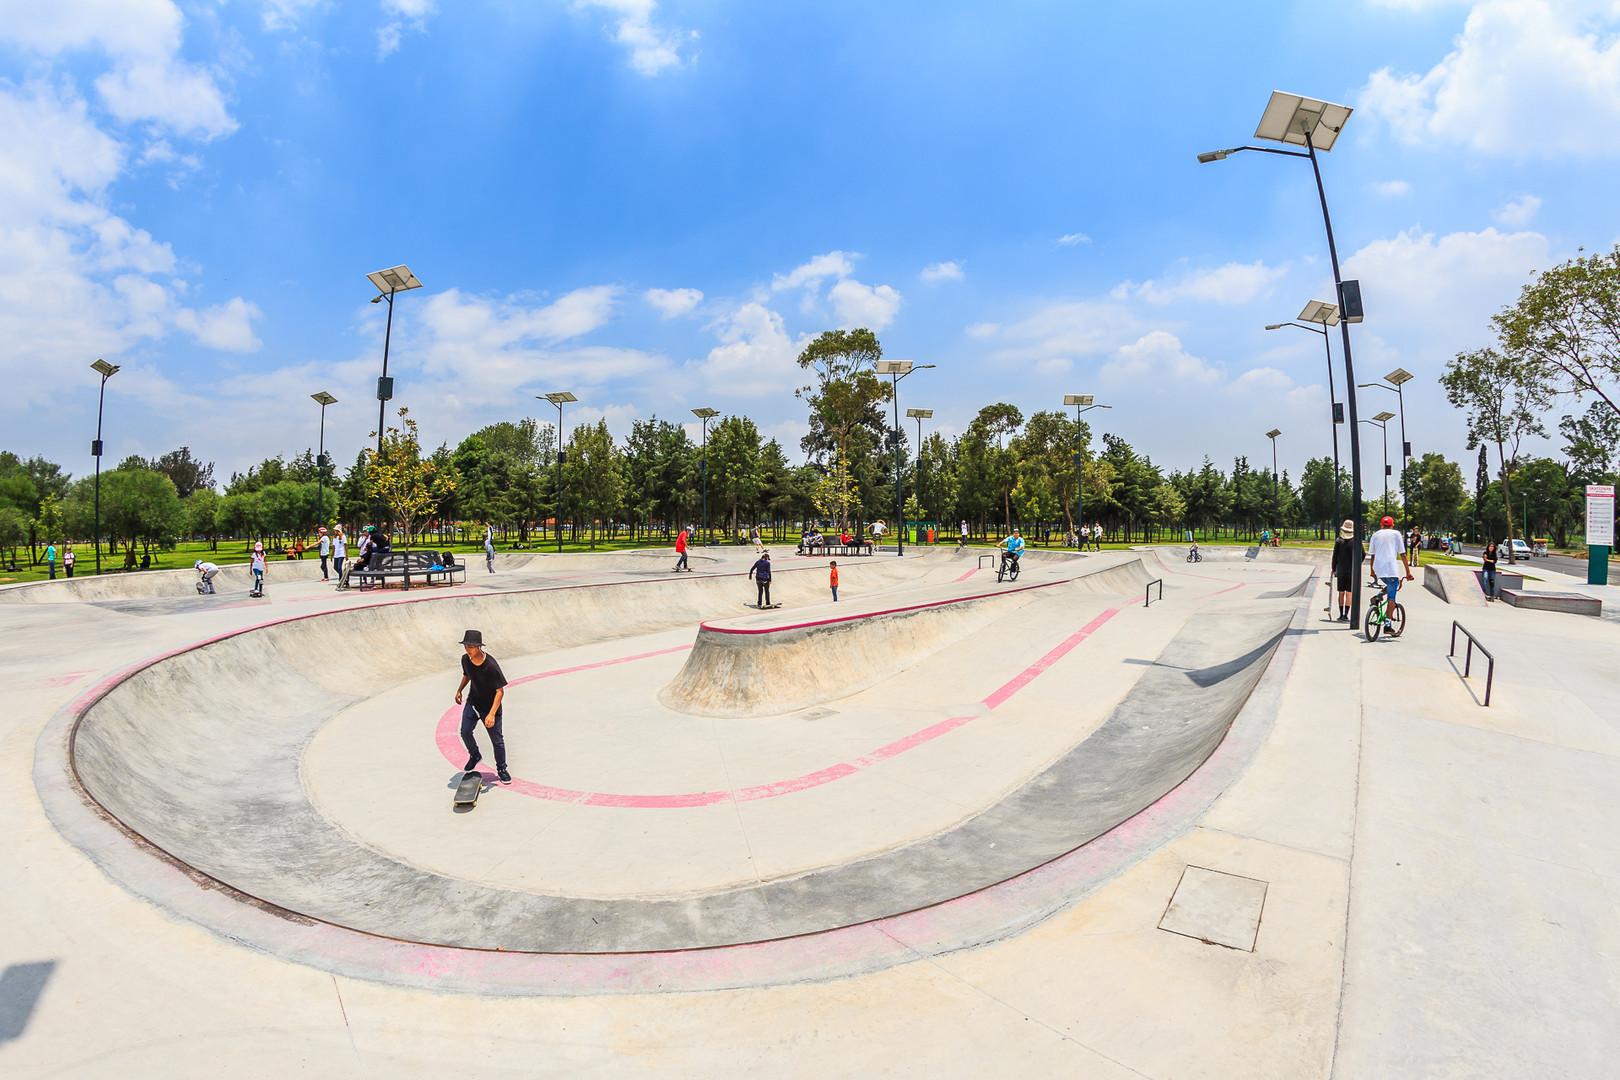 Skate Park, Bosque San Juan de Aragón